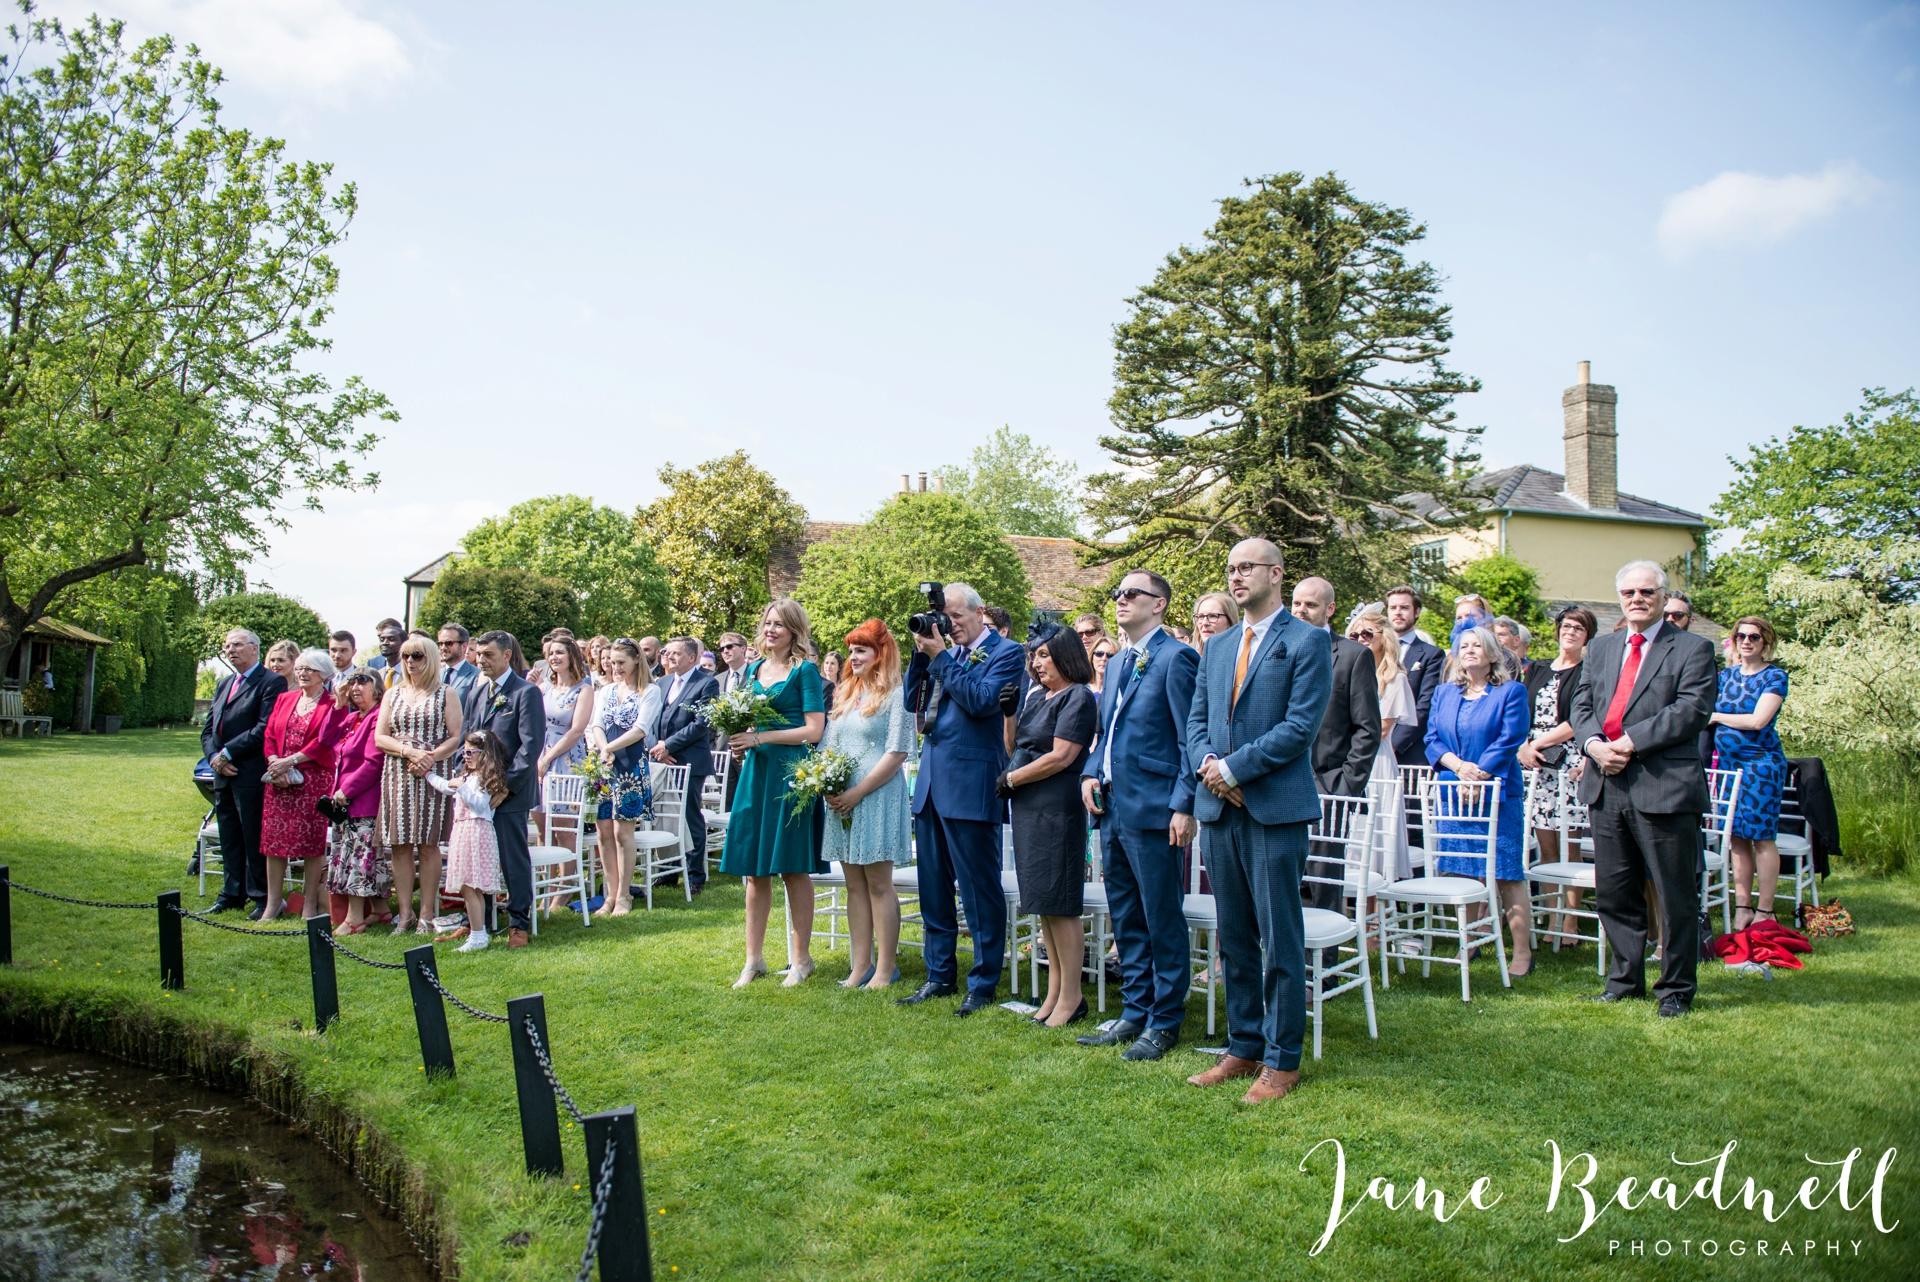 South Farm Wedding photography Hertfordshire by Jane Beadnell Photography fine art wedding photographer_0068